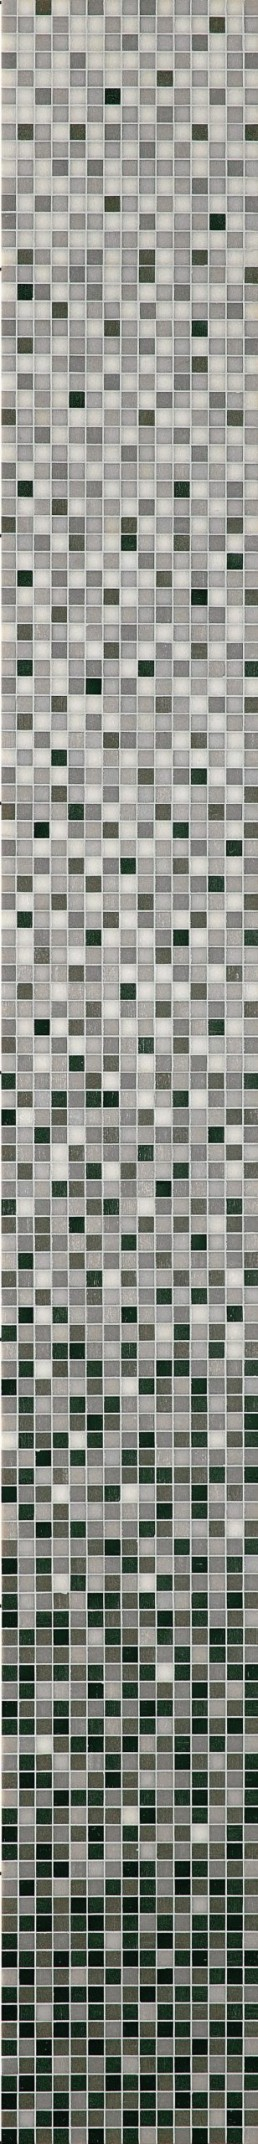 Bisazza NEW GRIGIA WHITELESS Swimming Pool Mosaic Blend